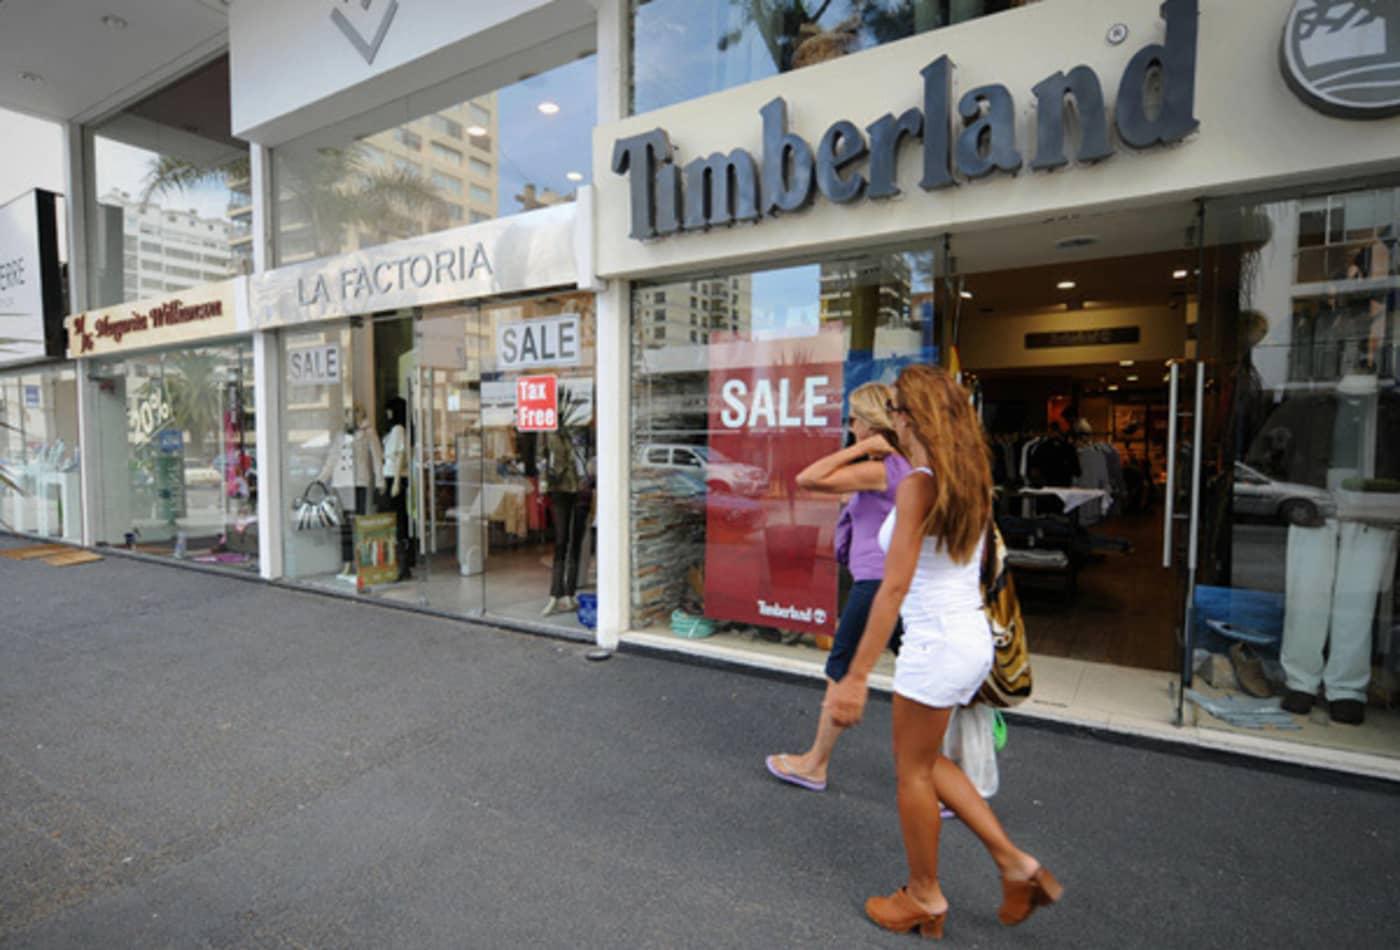 Retails-hottest-emerging-markets-2012-uruguay.jpg